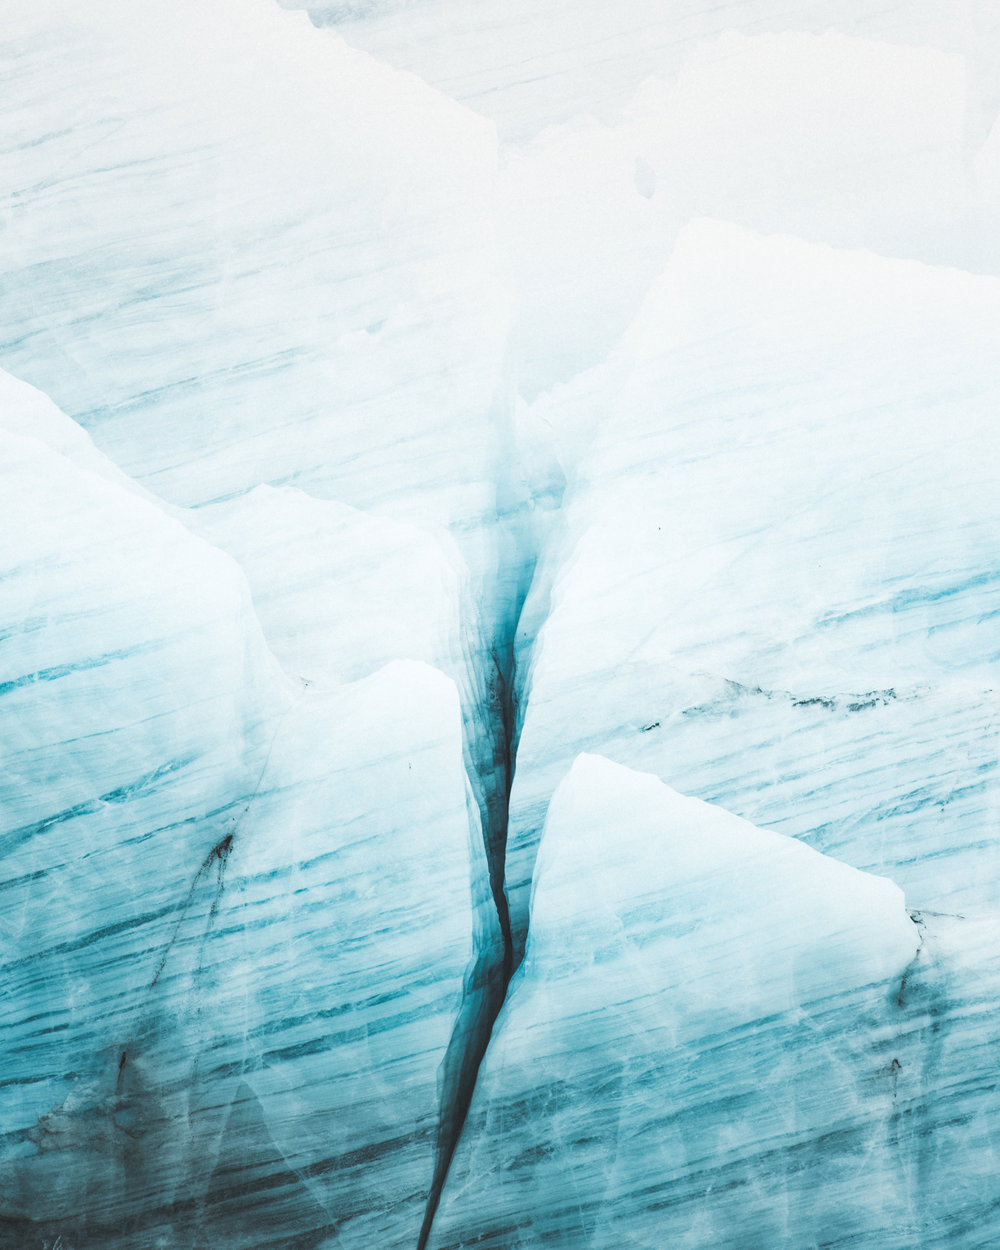 iceland-photography-benjamin-hardman-ísland-landscape-untitled_DSC1466.jpg